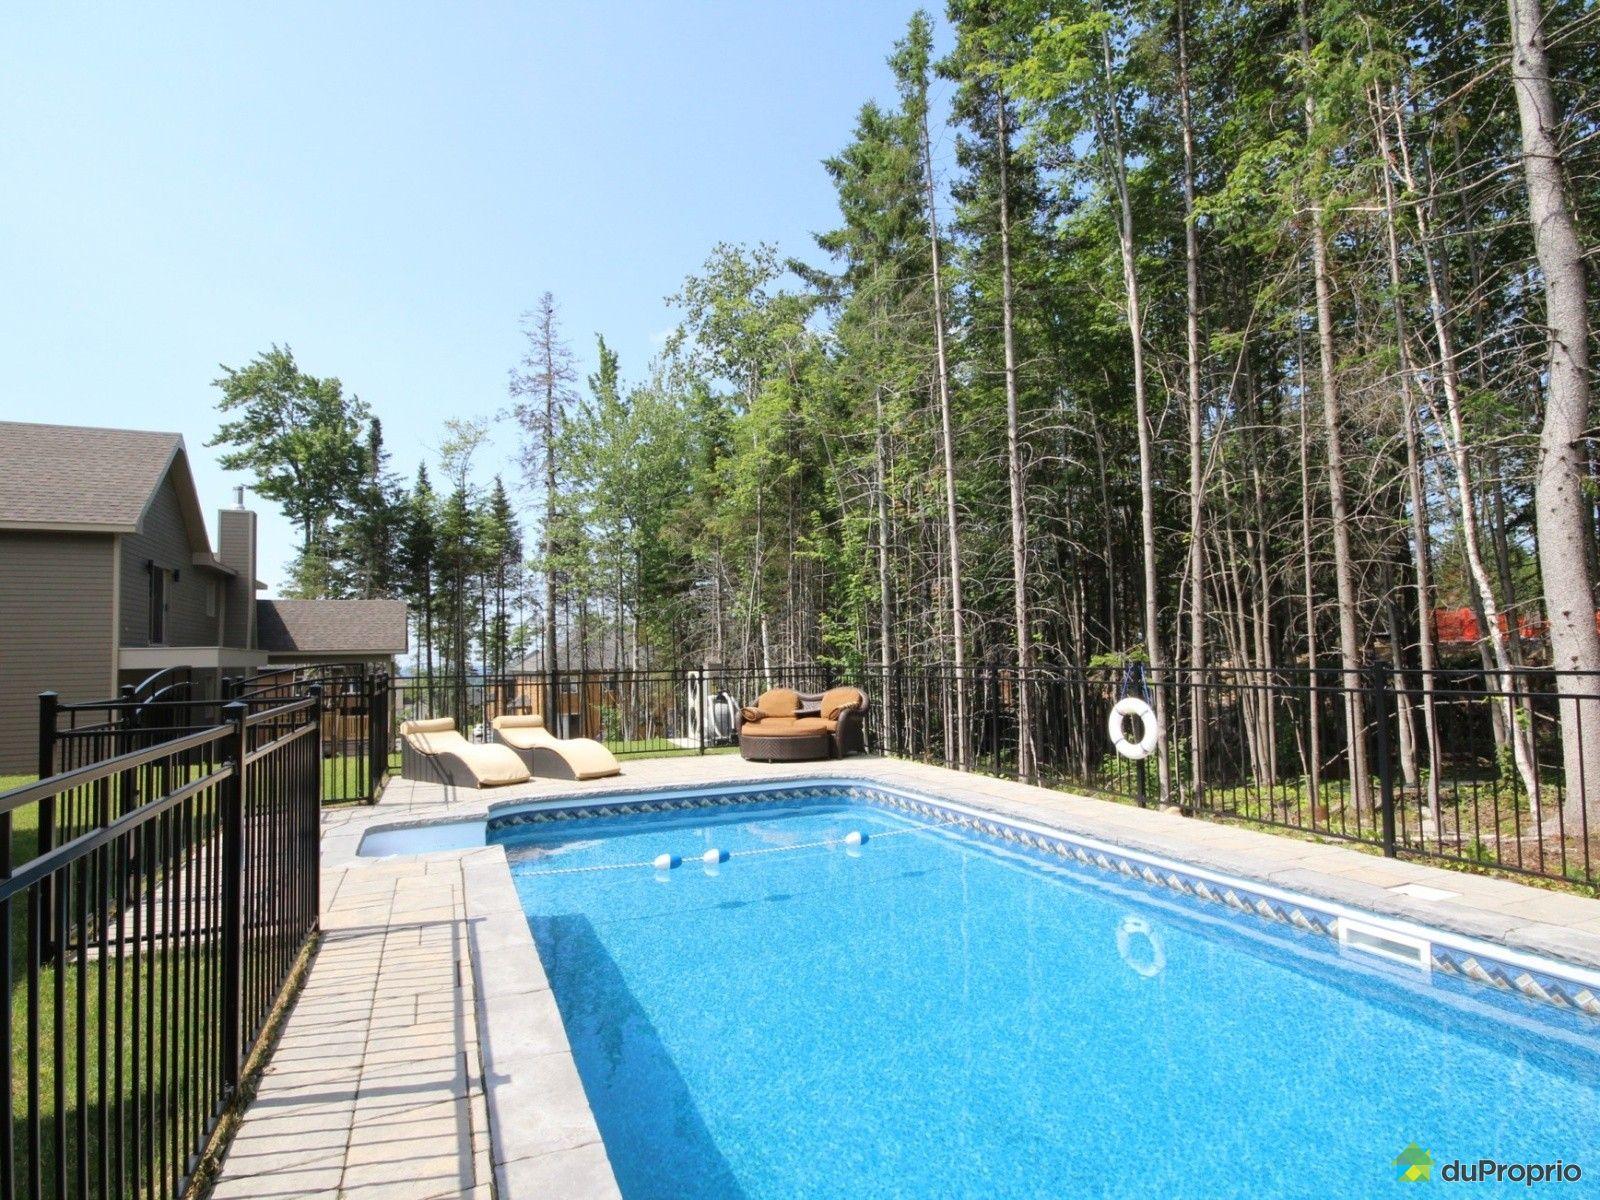 Maison vendre charlesbourg 9492 rue des li vres for Arpidrome charlesbourg piscine